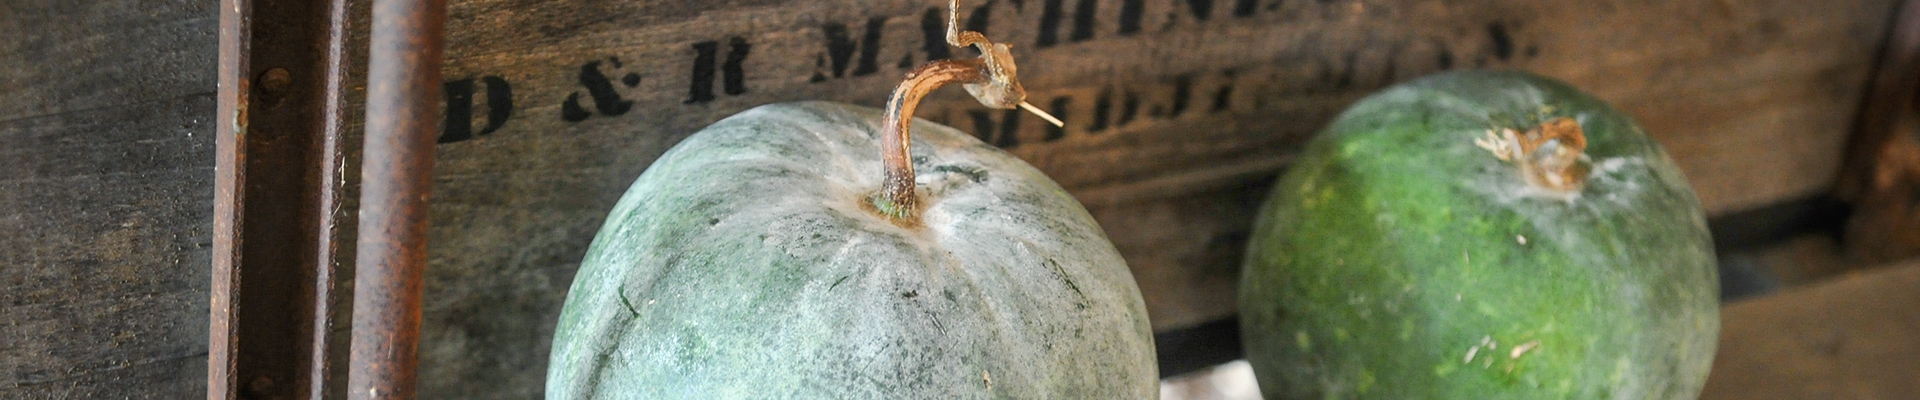 Wax Melon